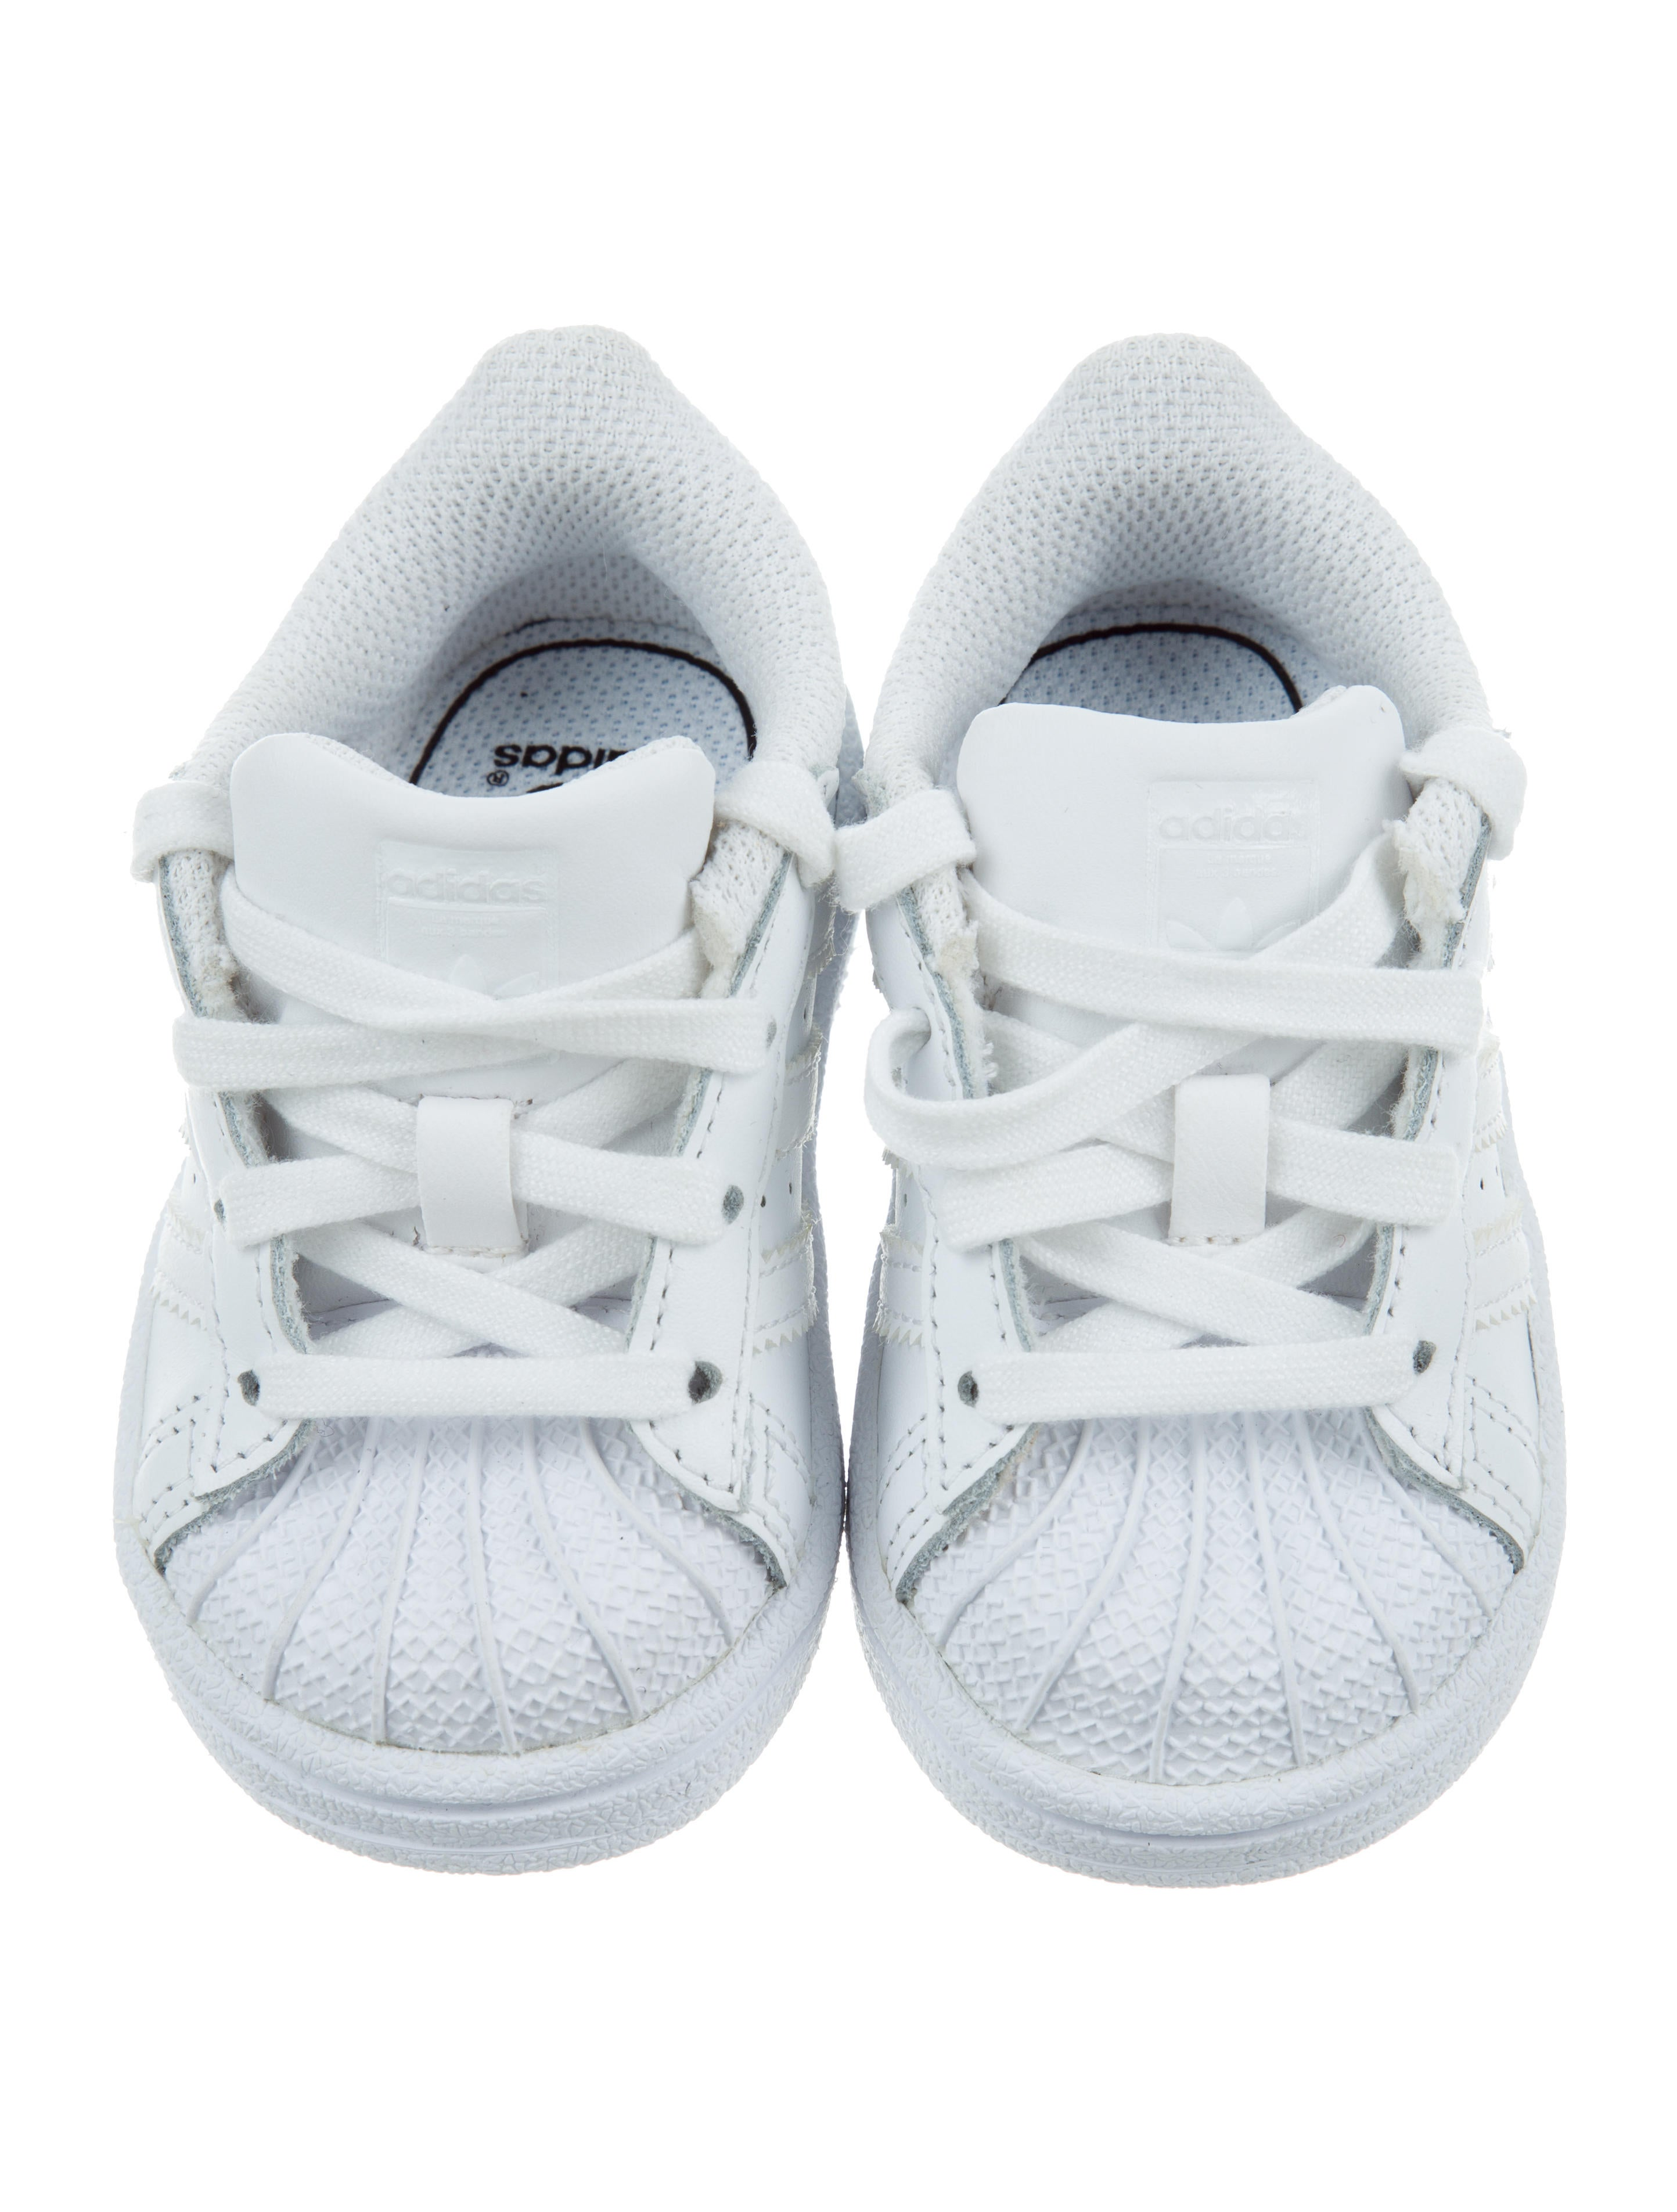 4a4a3fa85af4fe girls size 1 superstar adidas kids